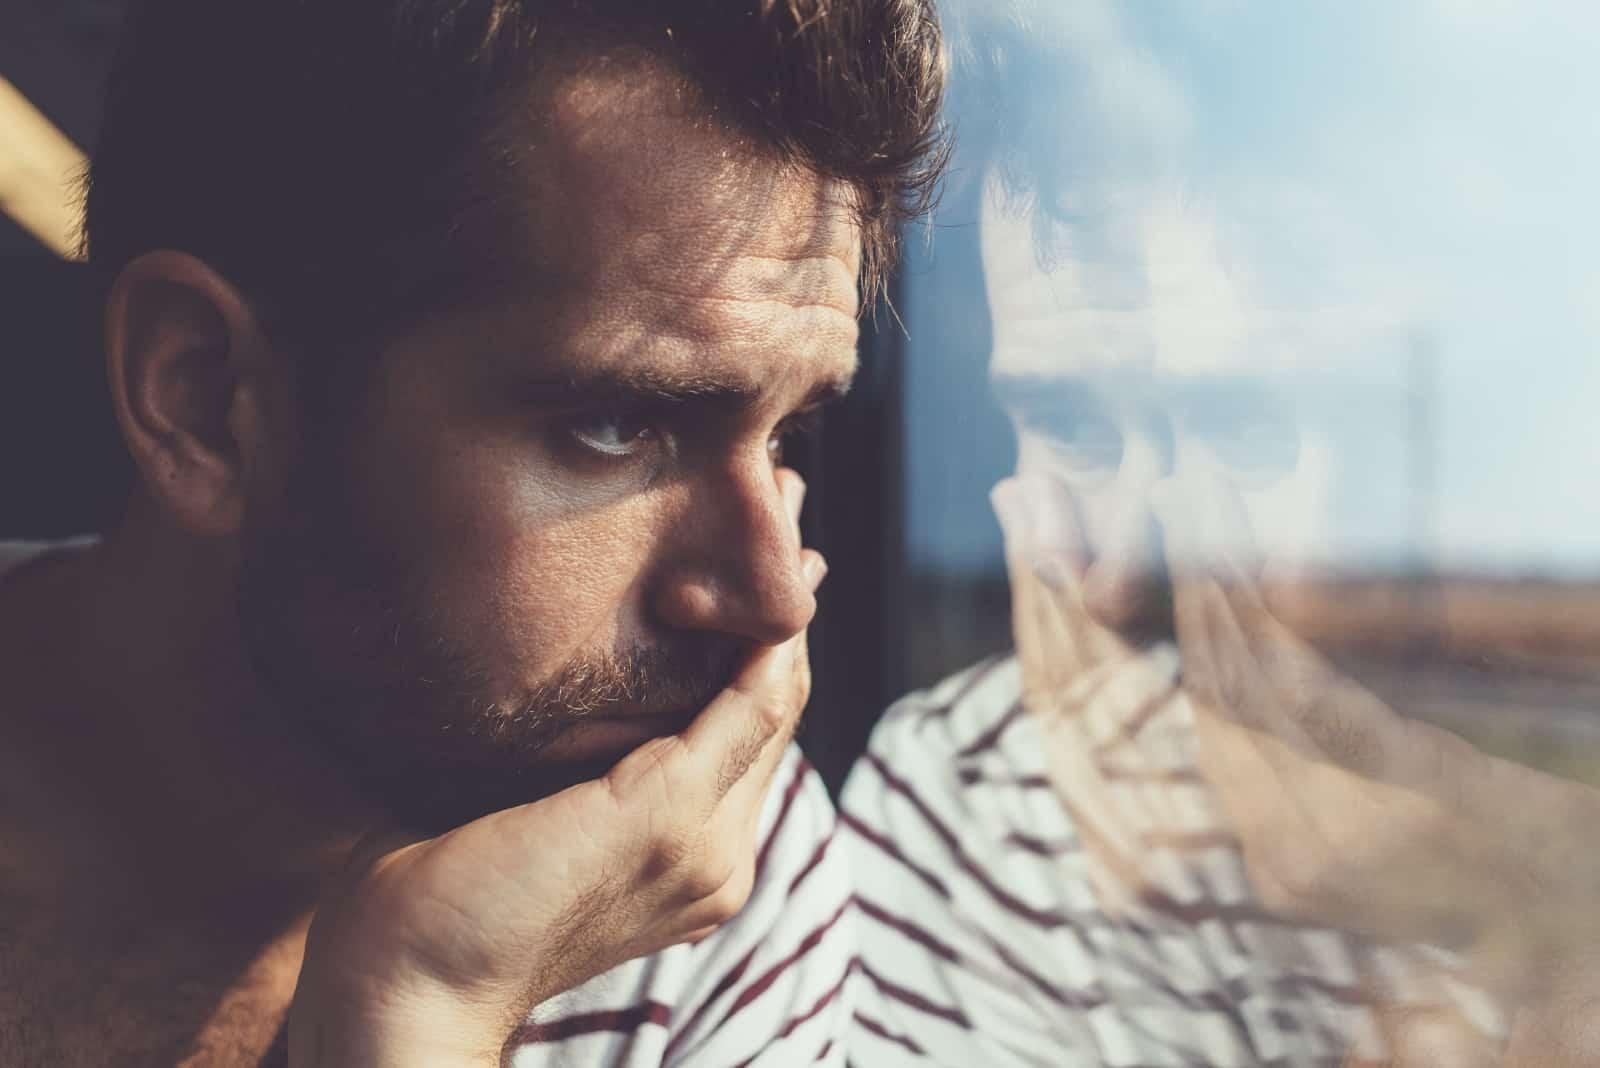 sad man in striped shirt looking through window